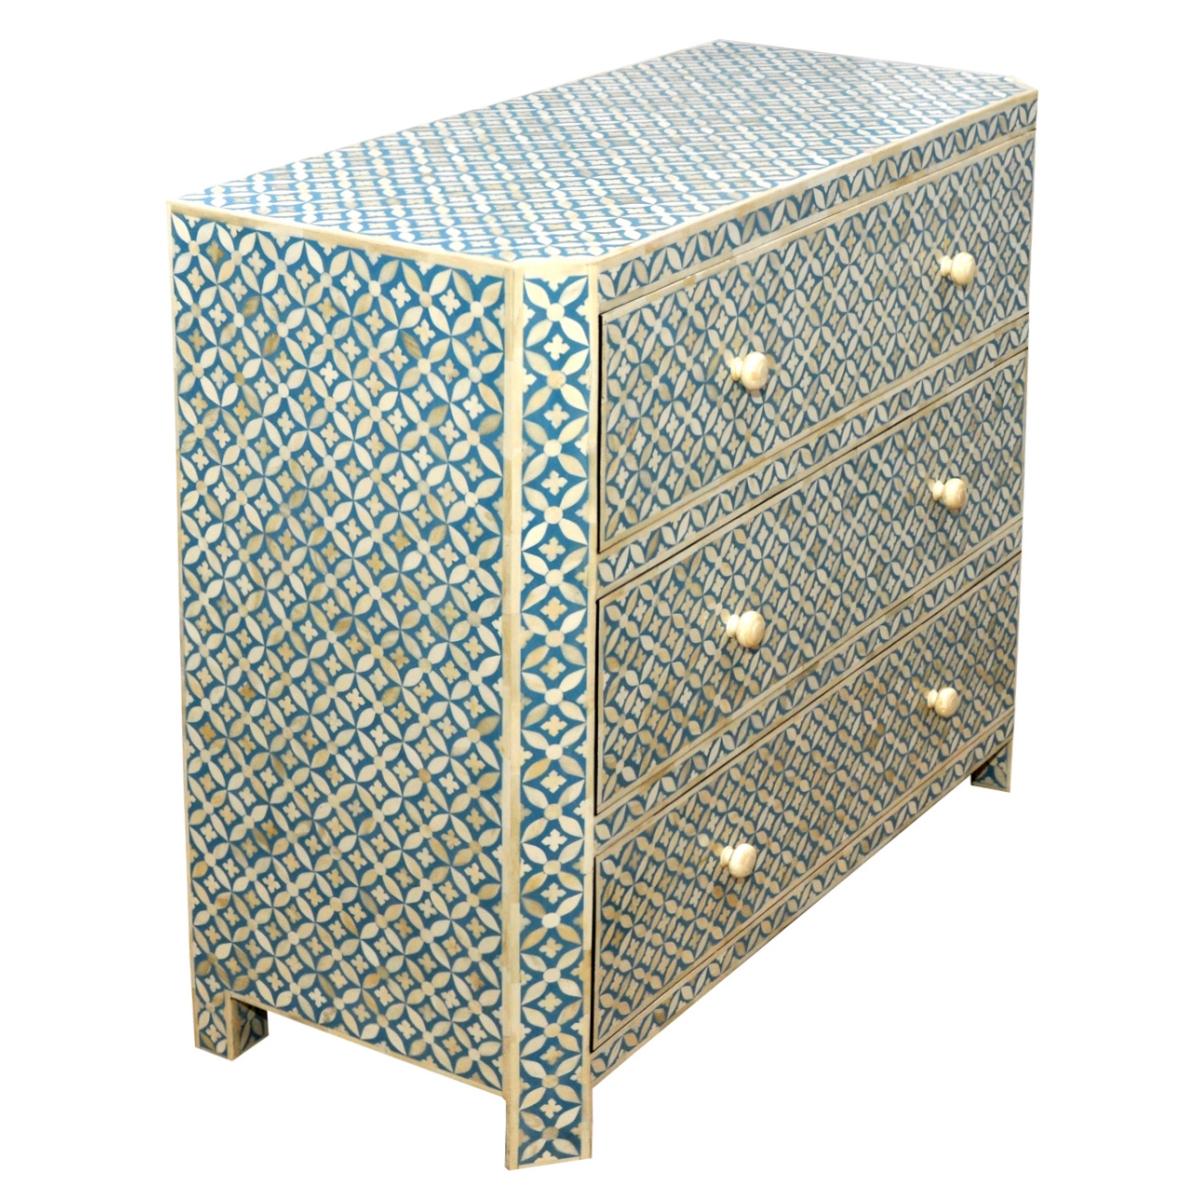 info for 3c03f 83622 Roomattic Aqua Blue Bone Inlay Chest of Drawers/ Dresser